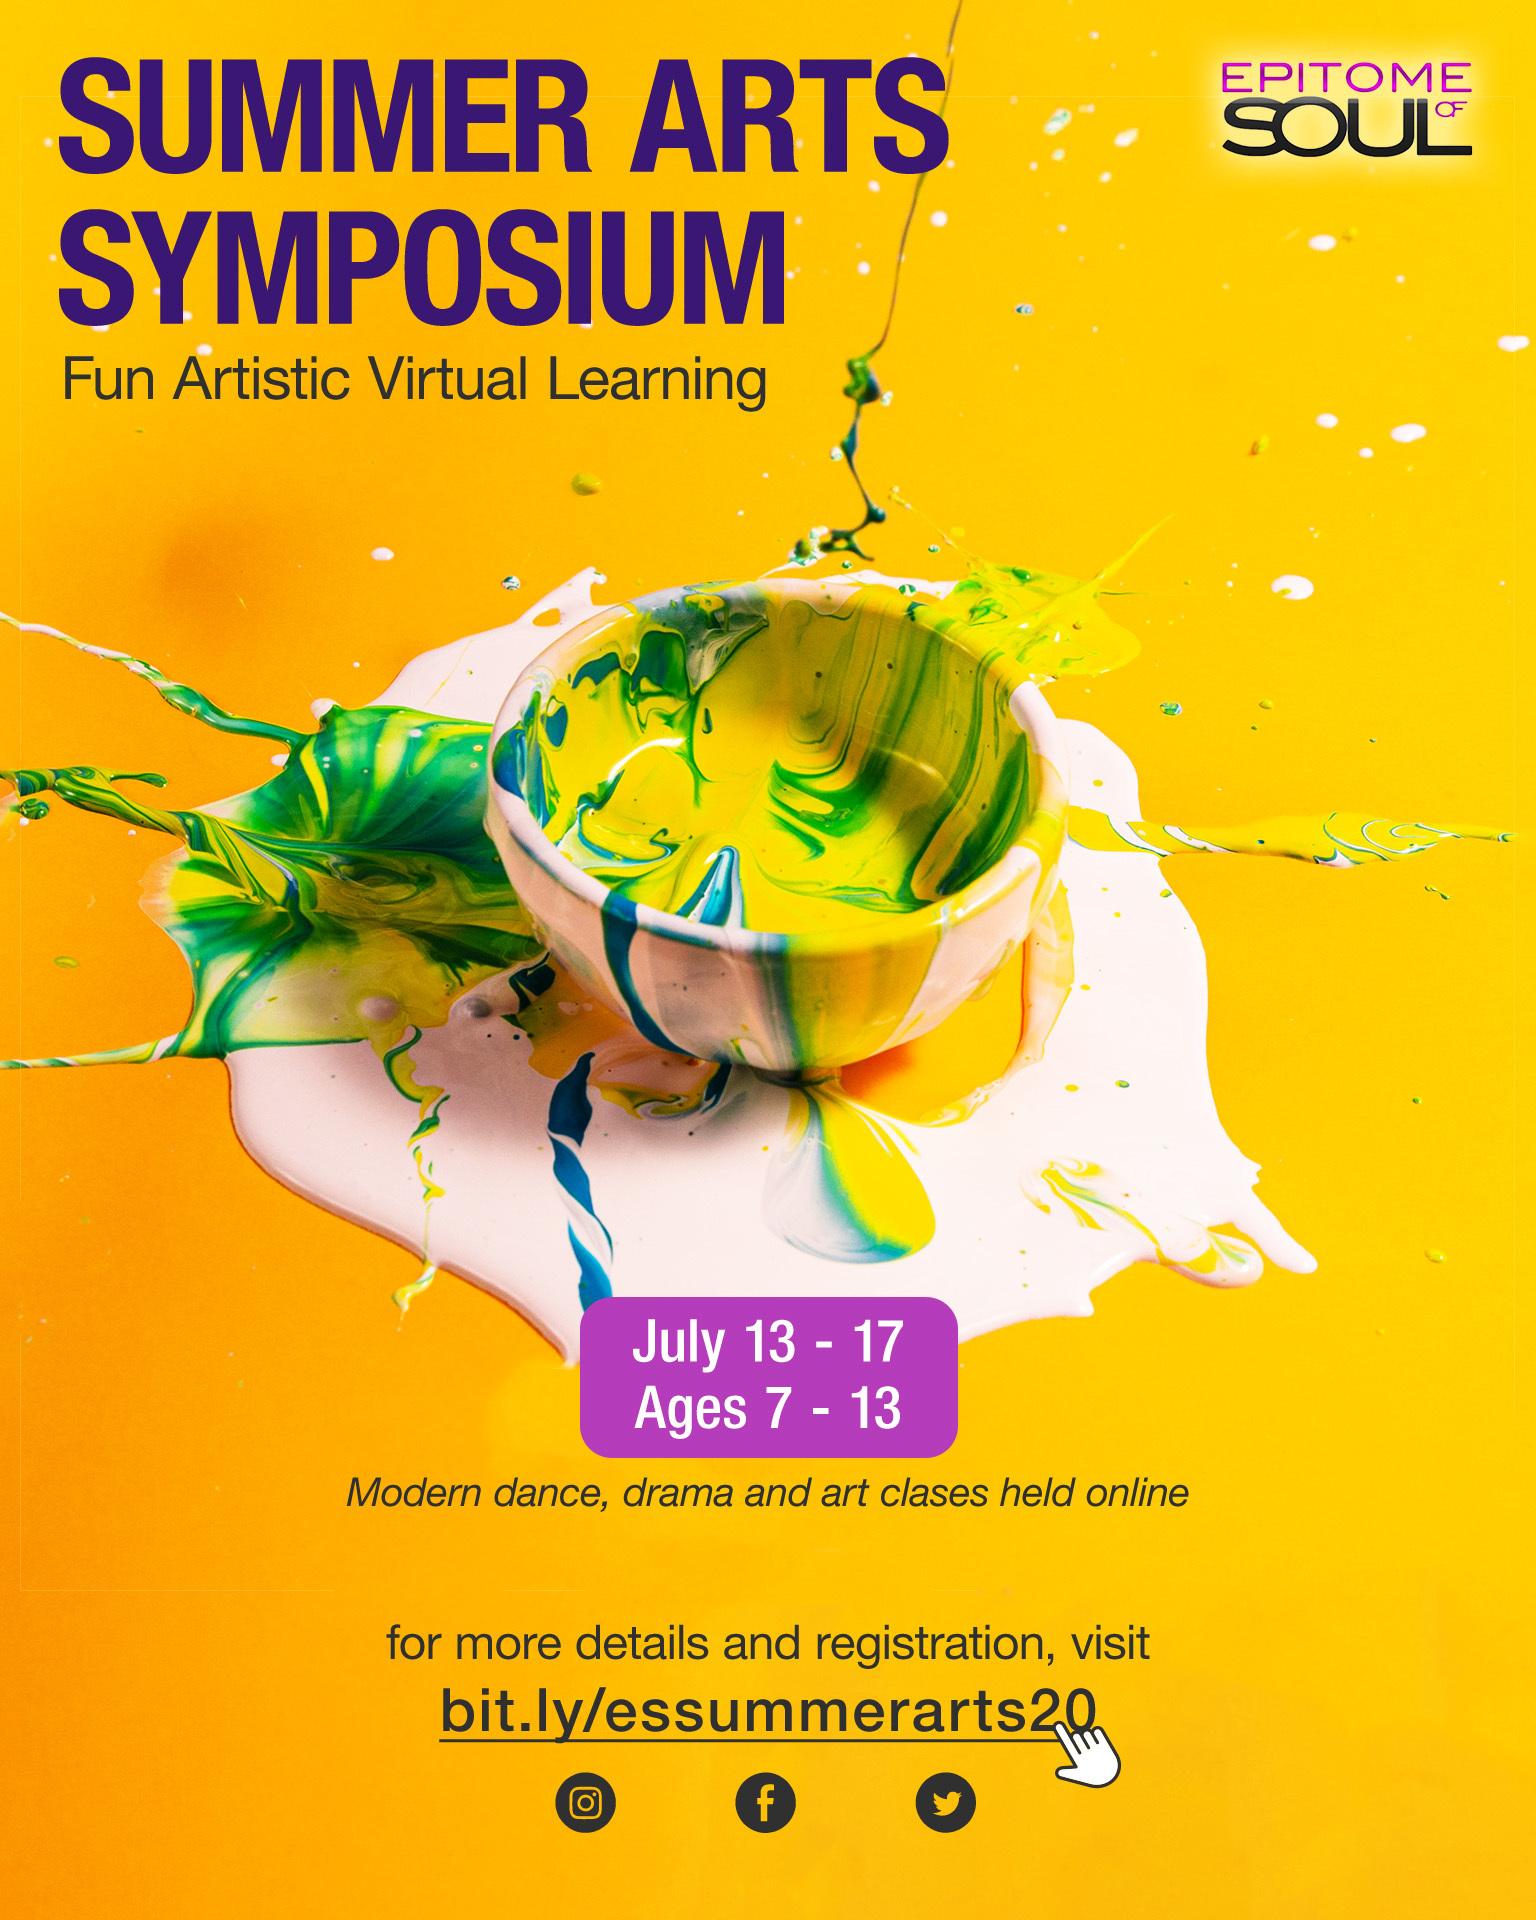 Summer Arts Symposium